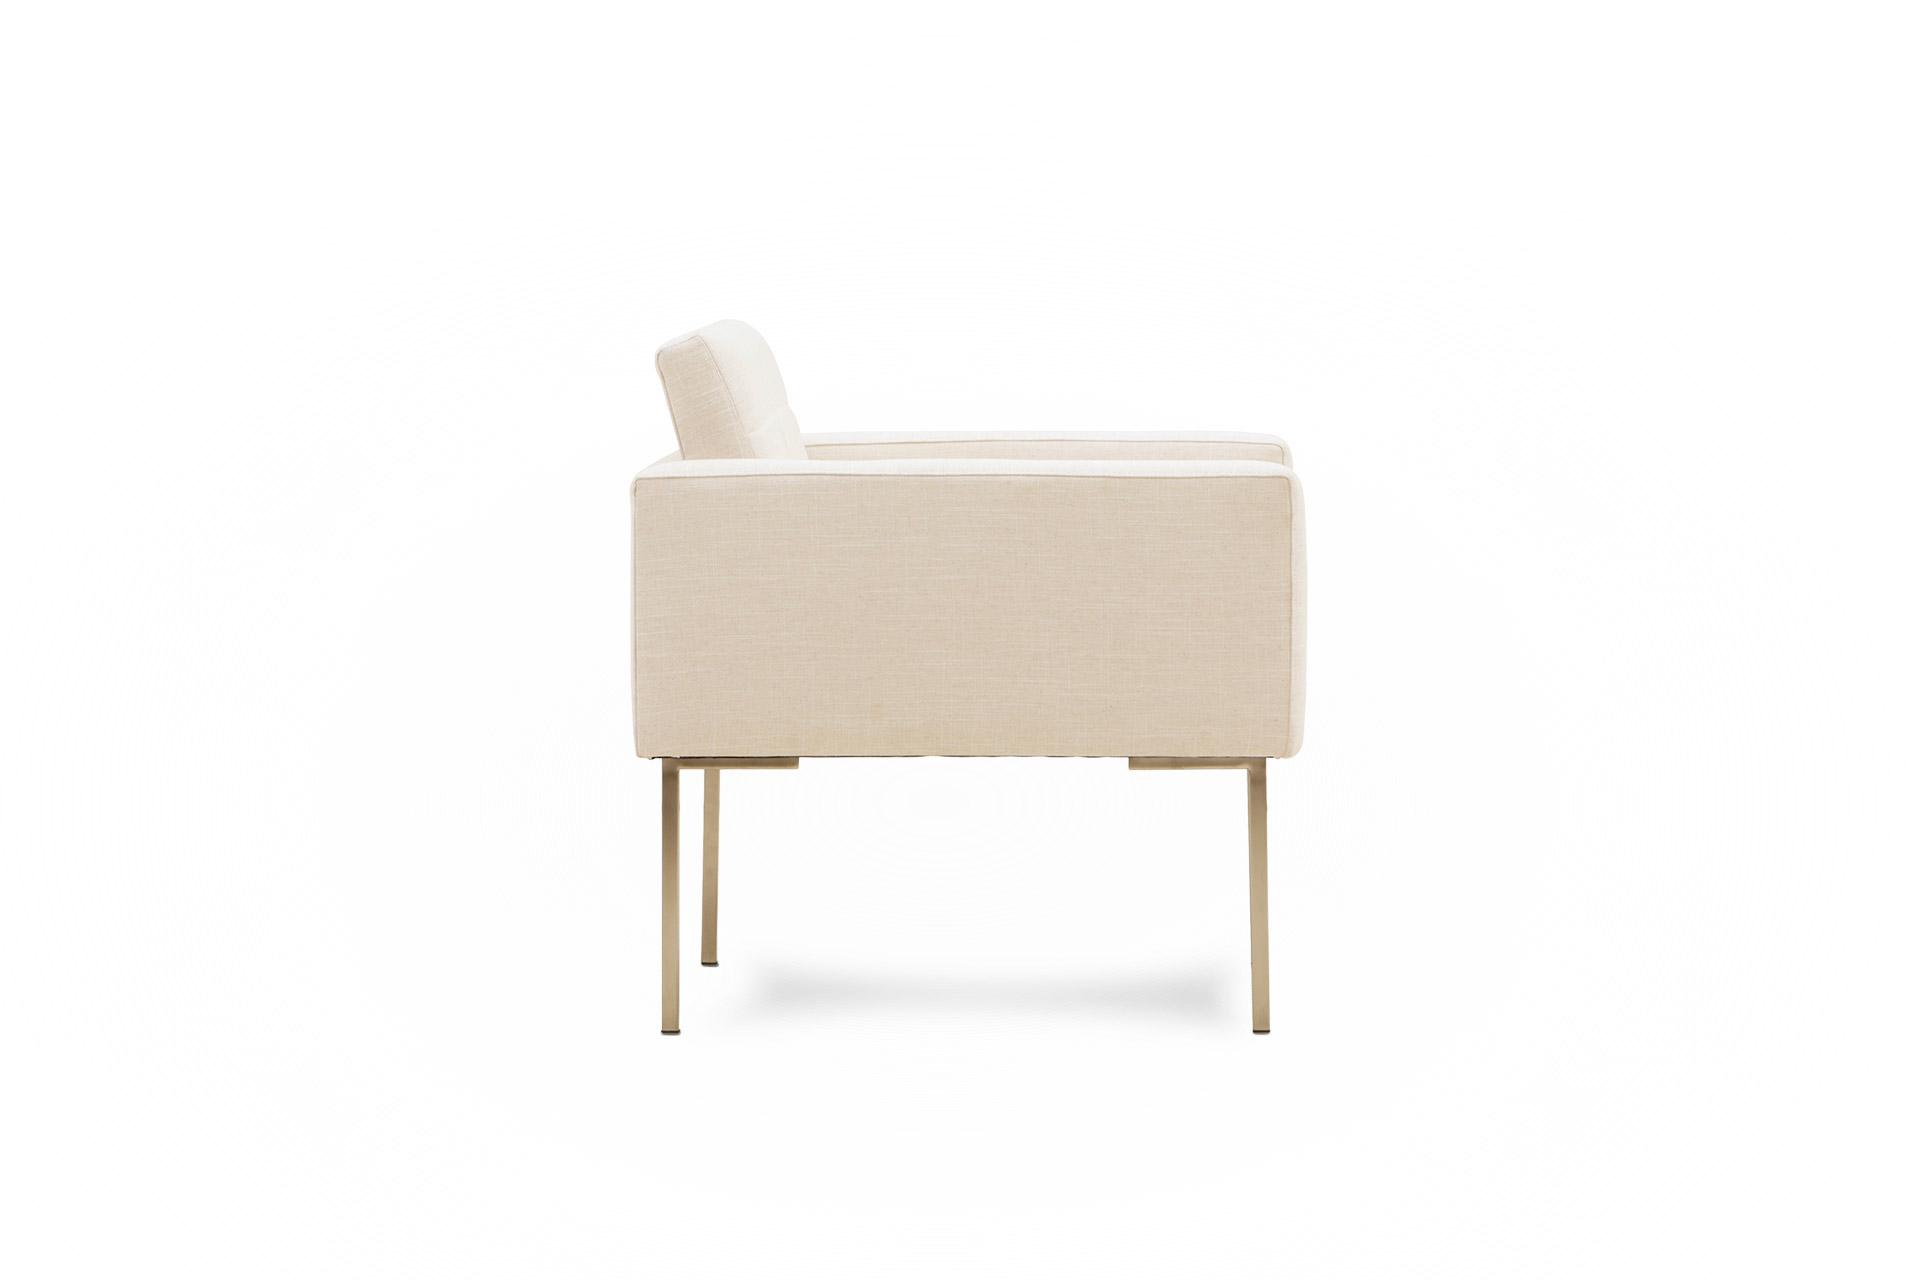 loft-and-manor-montlake-chair-1